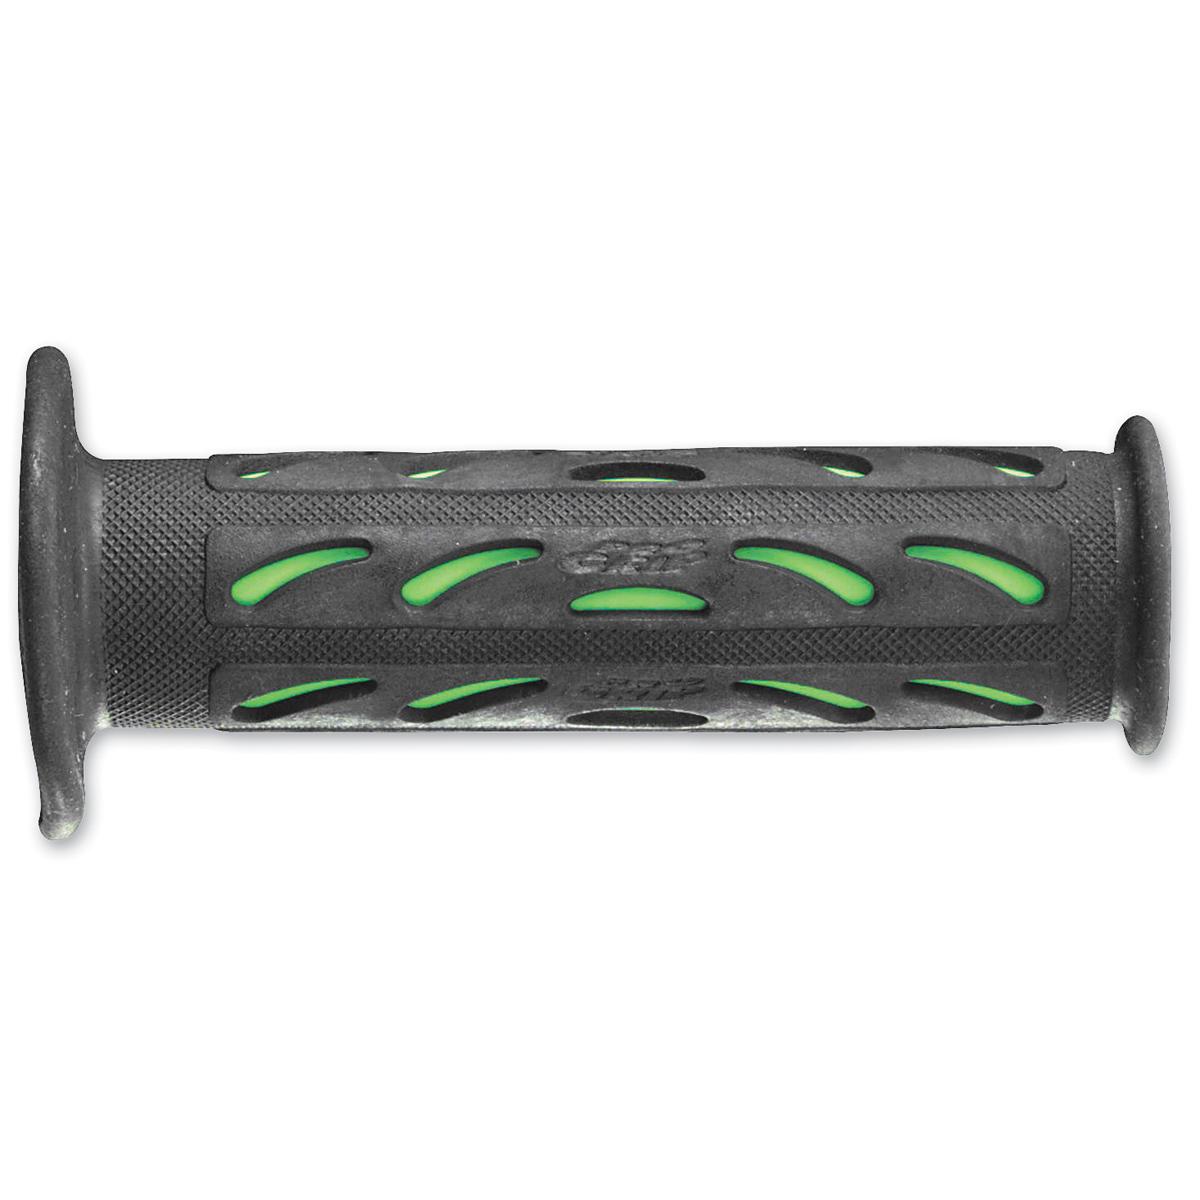 PROGRIP 728 Dual-Density Grips Black/Green